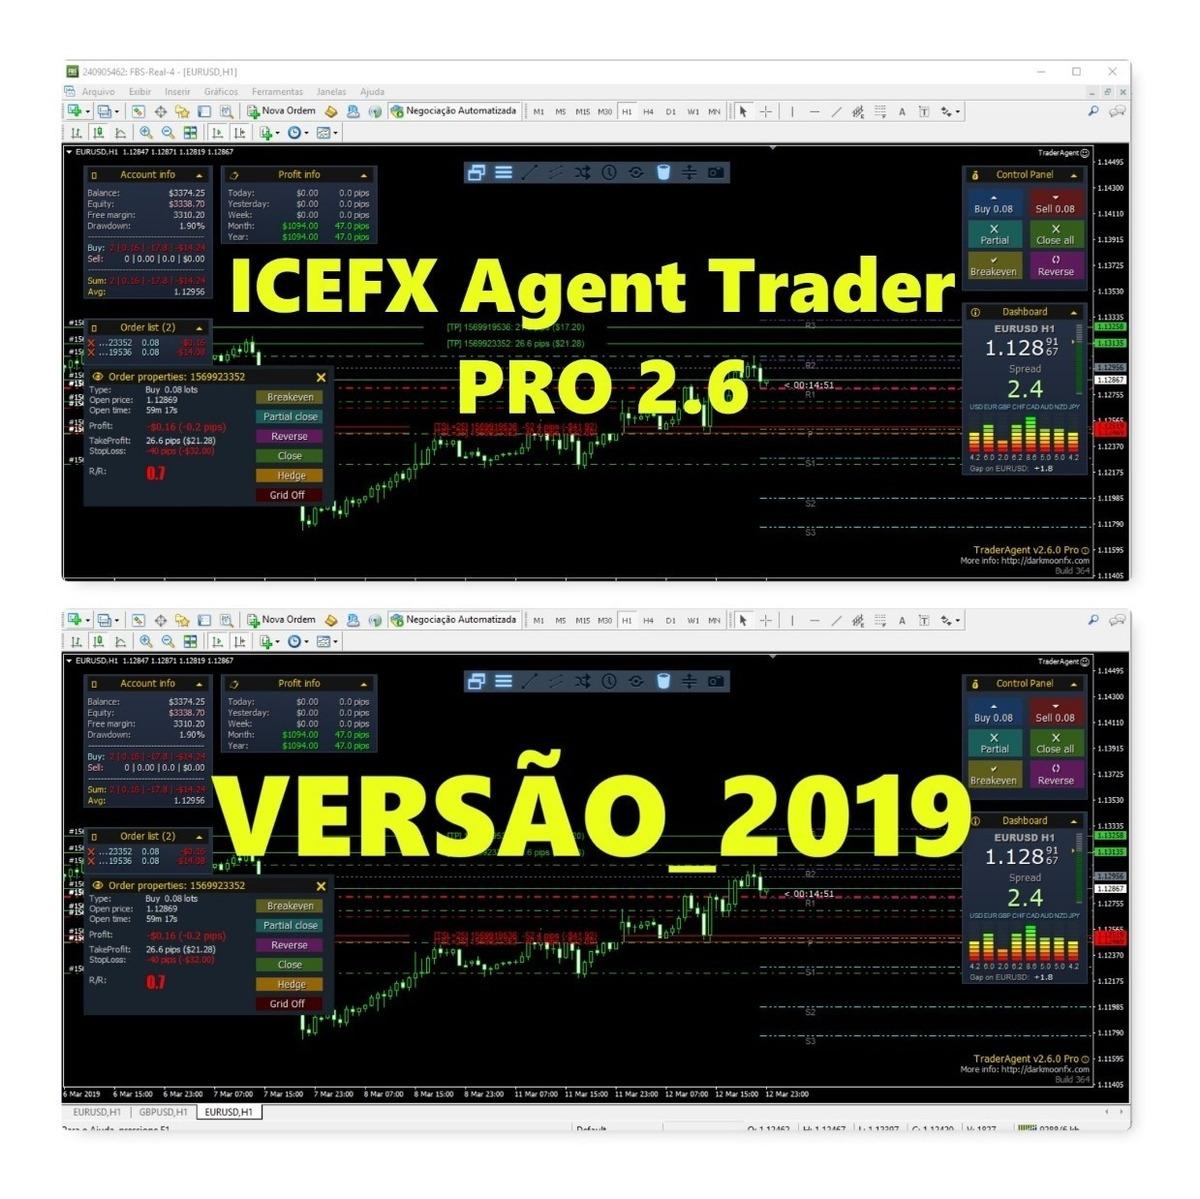 Robo Forex Icefx Agent Trader Pro 2 6_vidéo Aqui